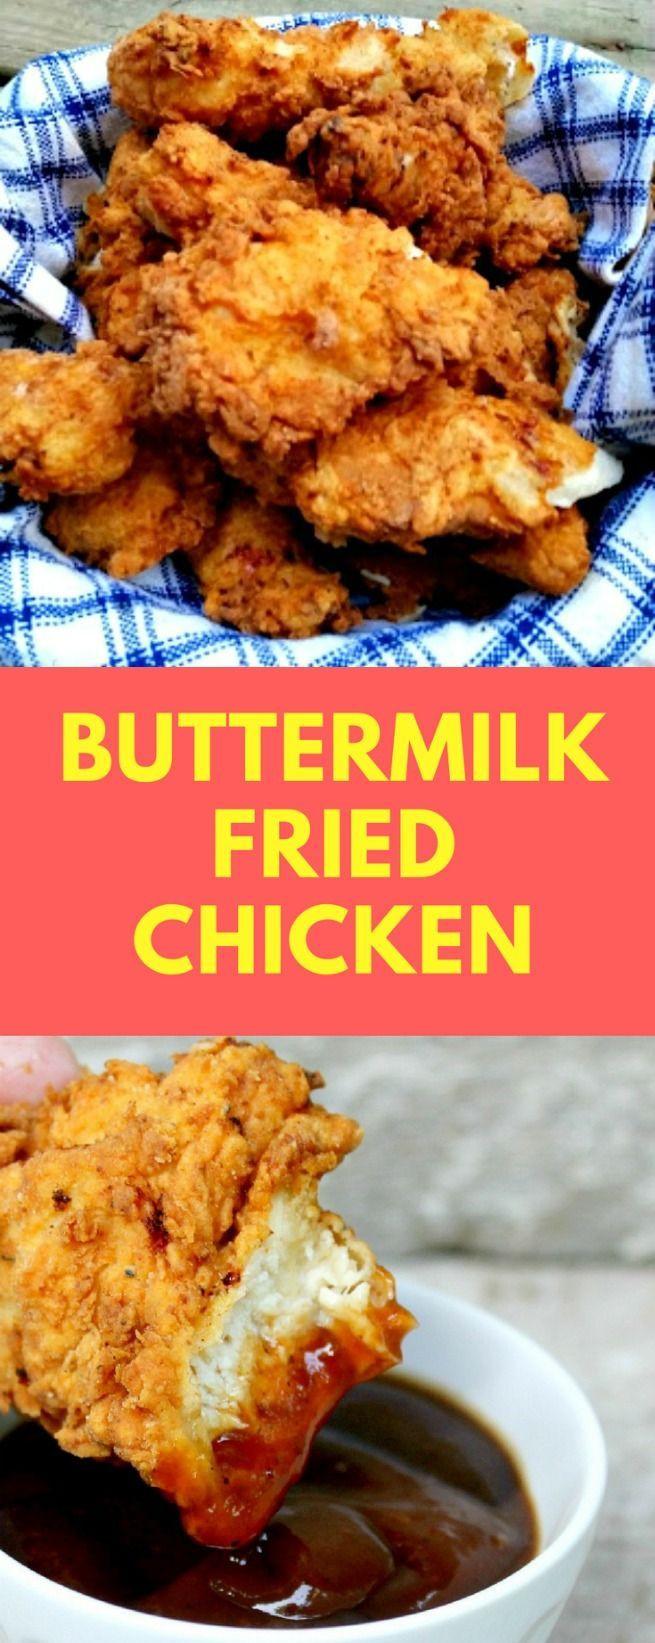 Buttermilk Fried Chicken Recipe  Best 25 Fried chicken ideas on Pinterest